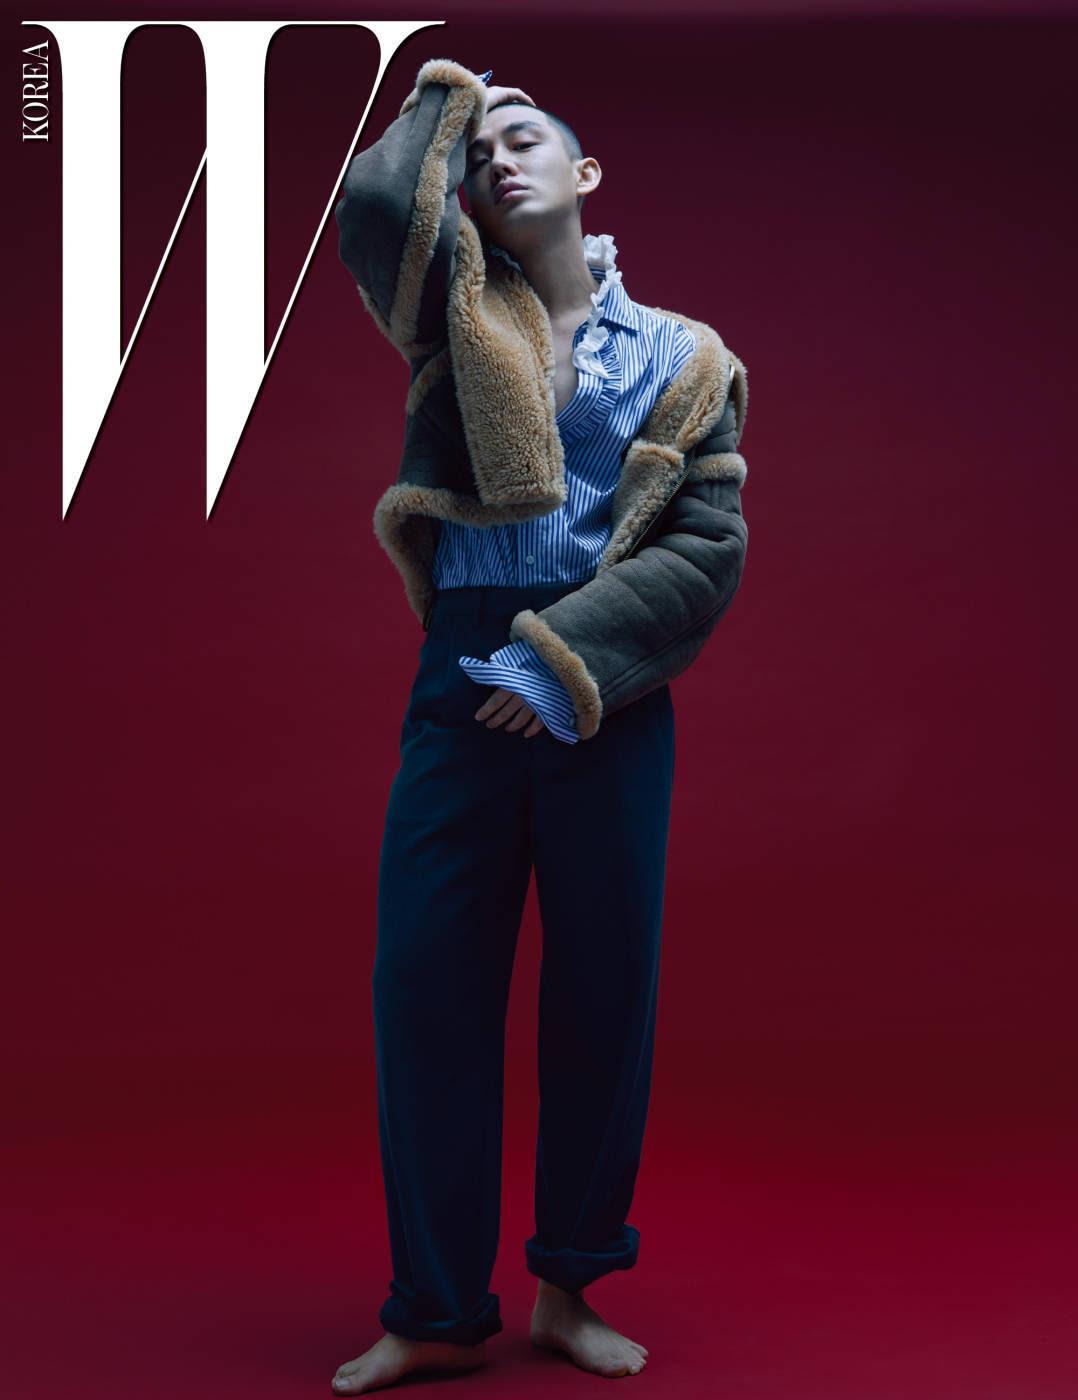 Yoo Ah In - W Magazine January Issue '17